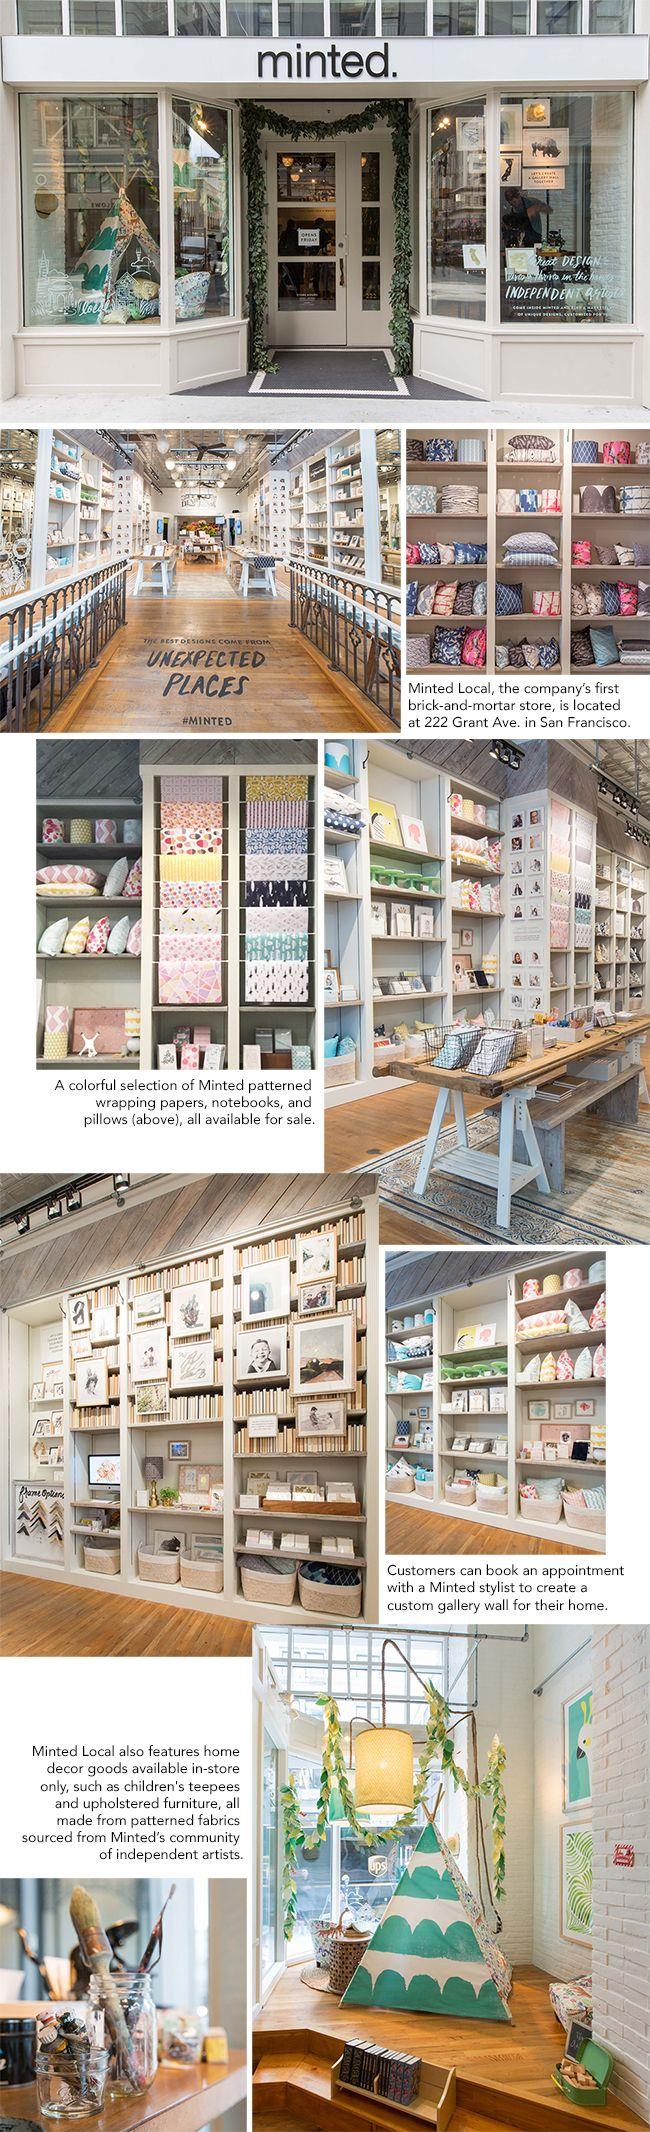 best 25 retail stores ideas on pinterest retail store design